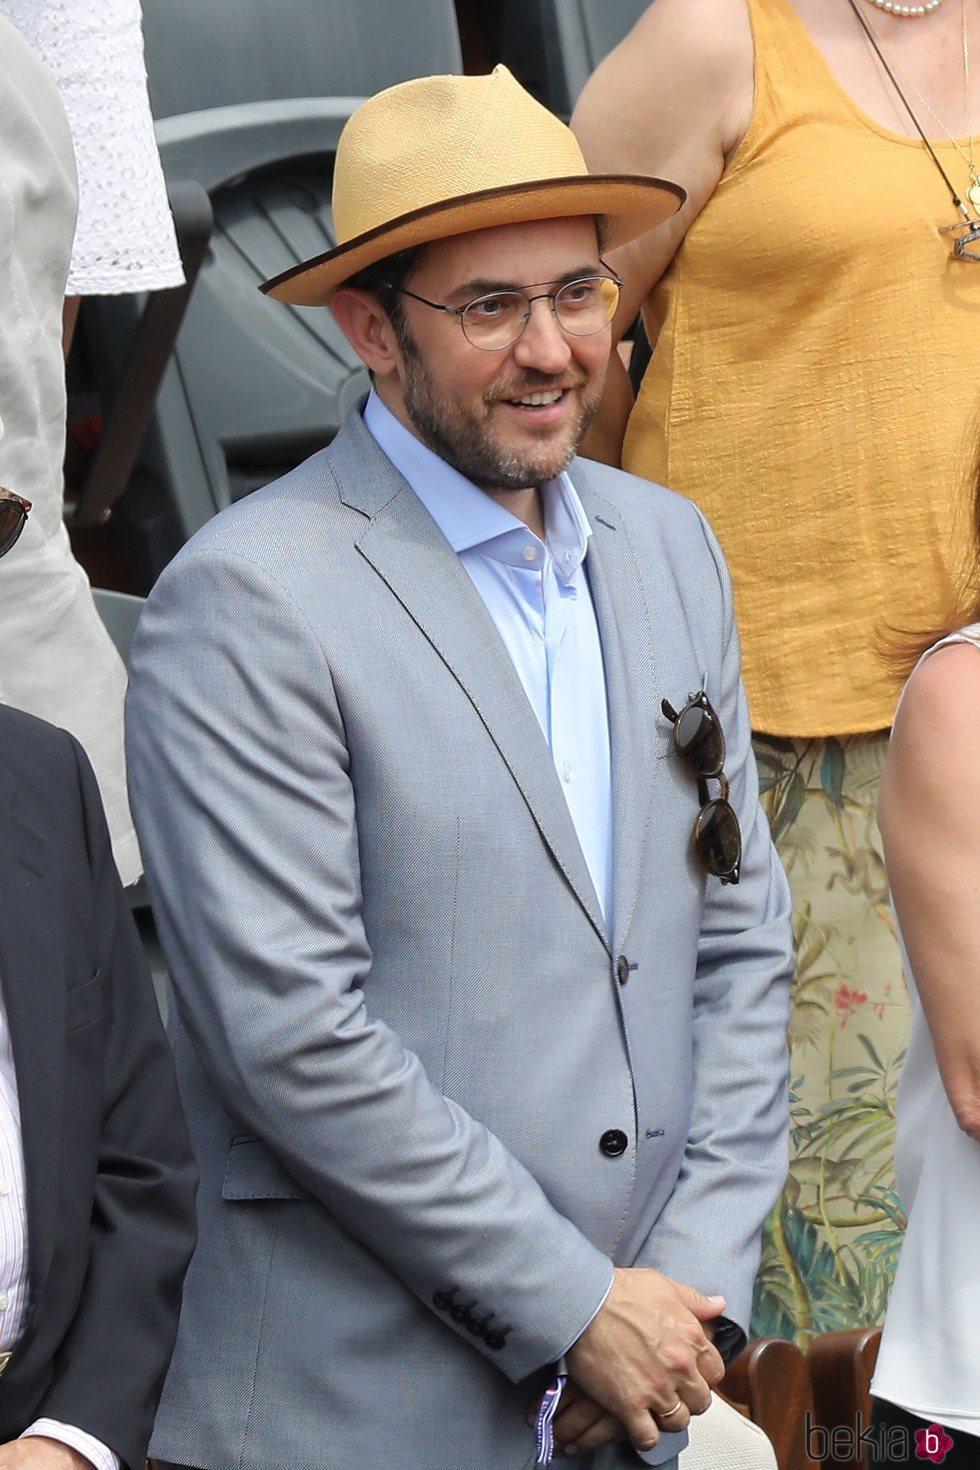 Màxim Huerta ejerce de Ministro de Cultura y Deportes acudiendo al Roland Garros 2018